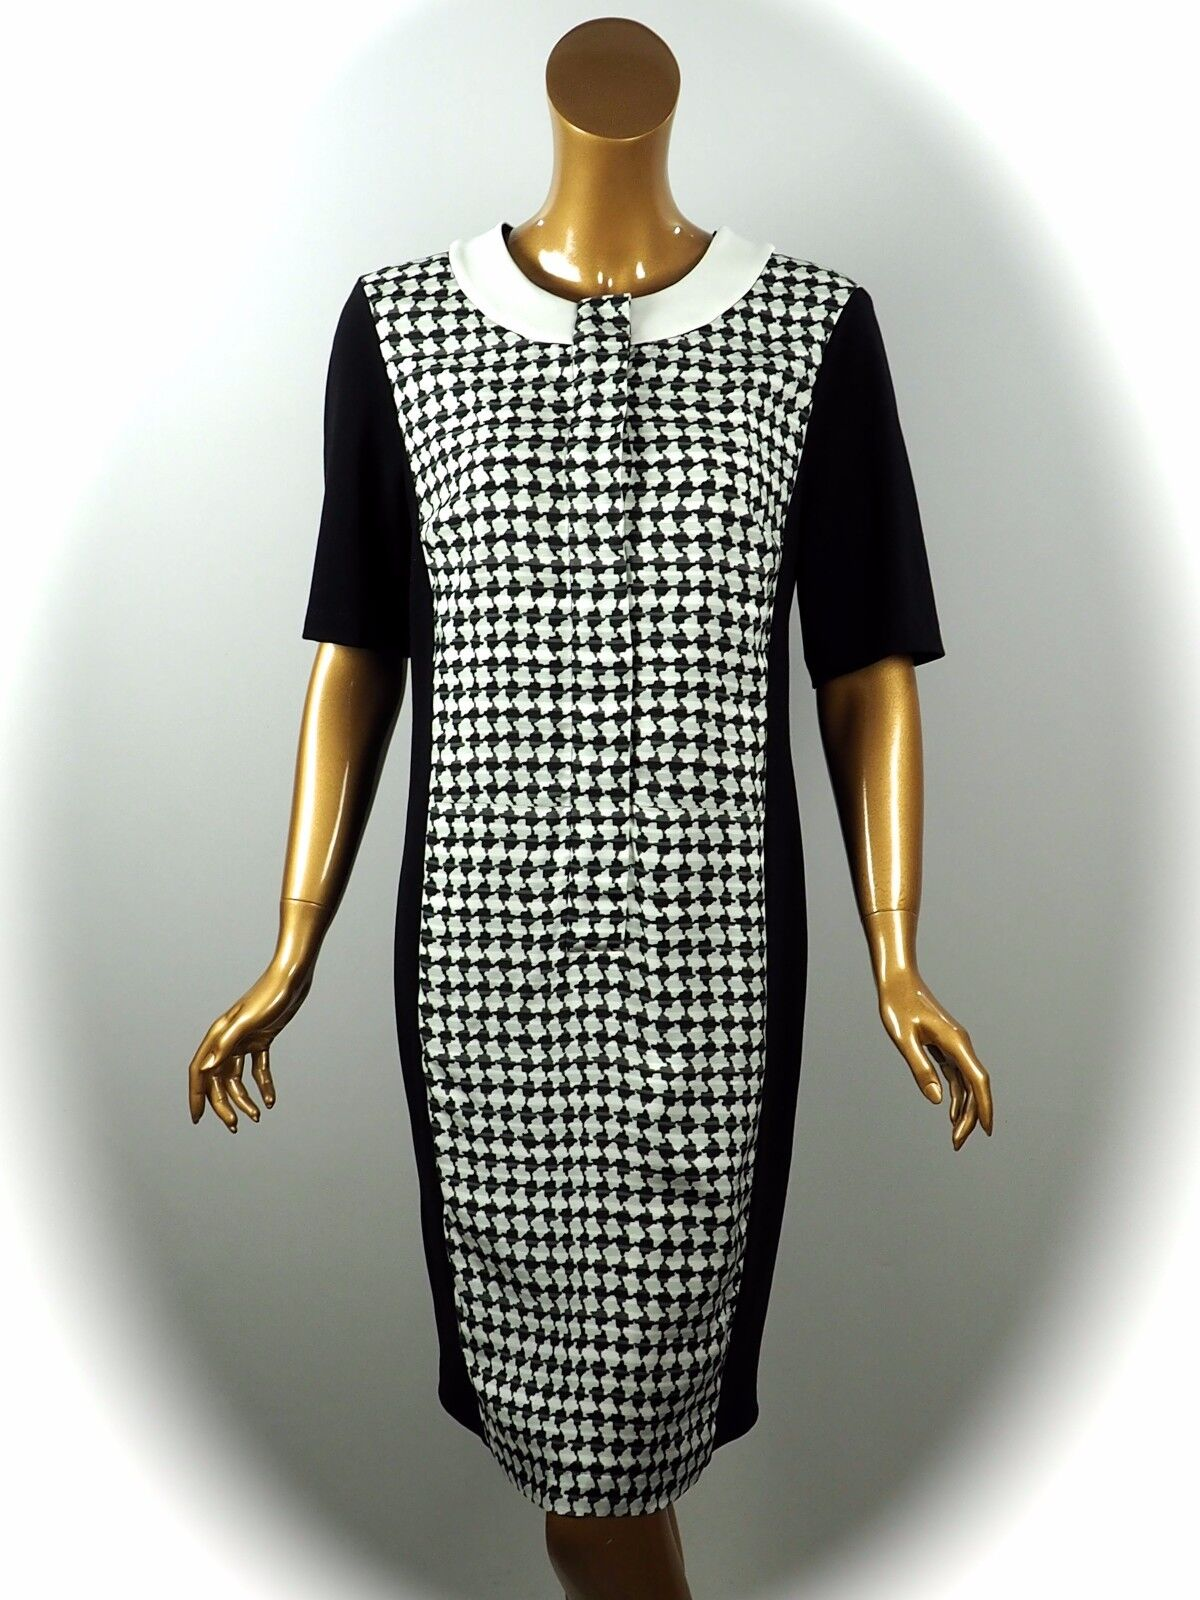 864fef2a0e06 neroy Dress Dress Dress esclusivo legeres Abito Taglia 40 NUOVO 93c152